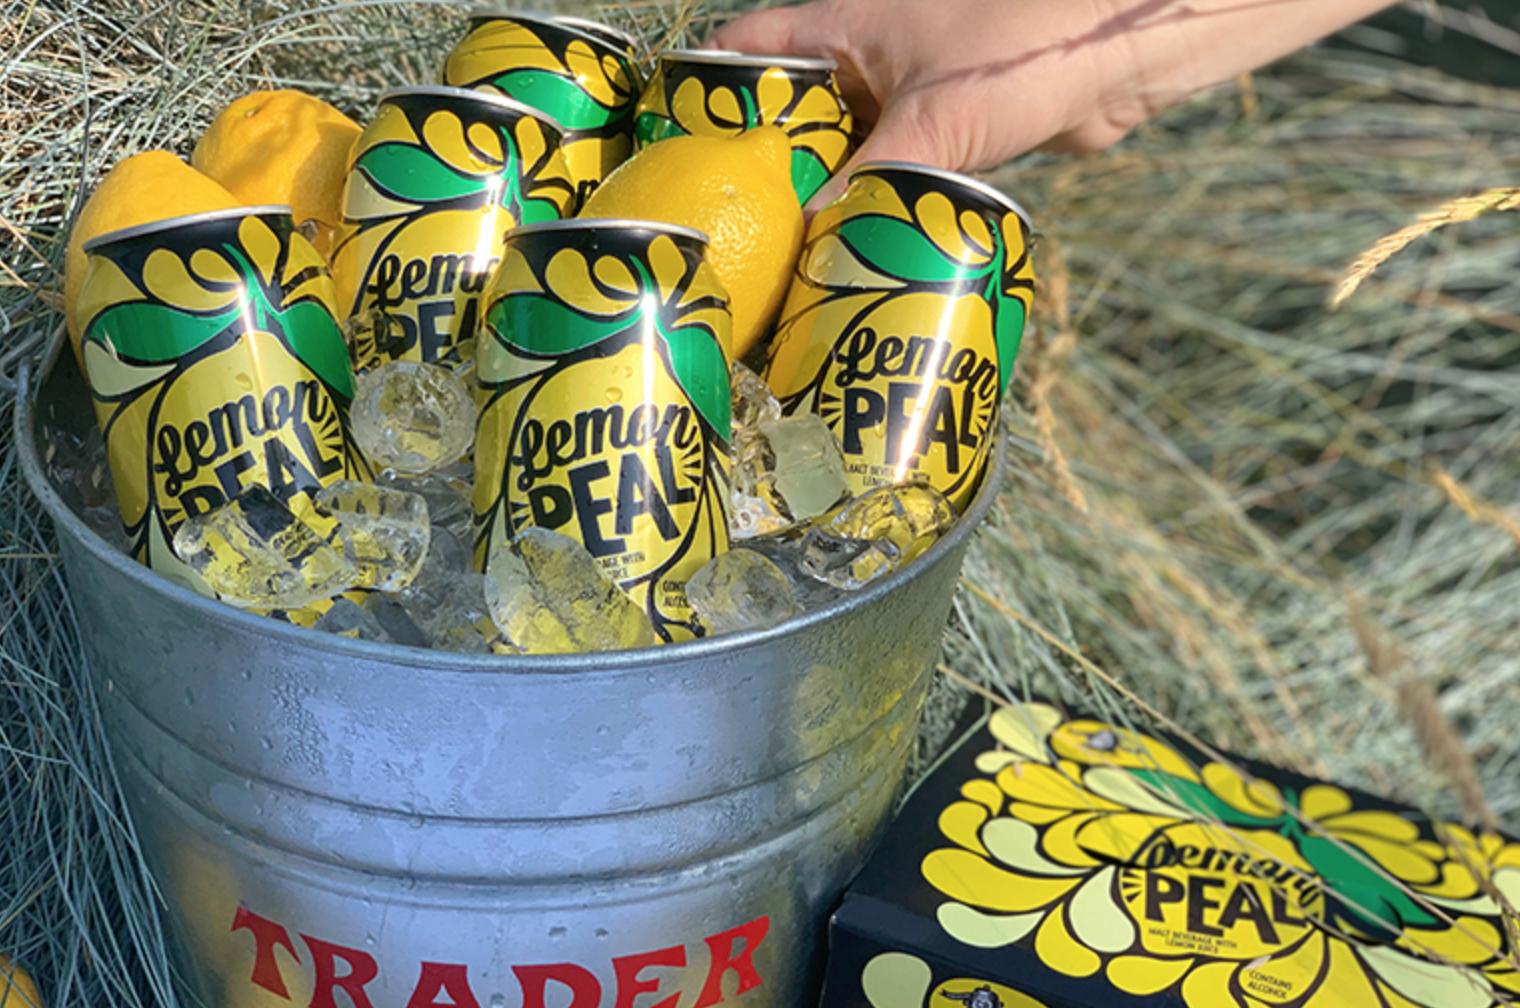 Trader Joe's Just Debuted Hard Lemonade in a Can